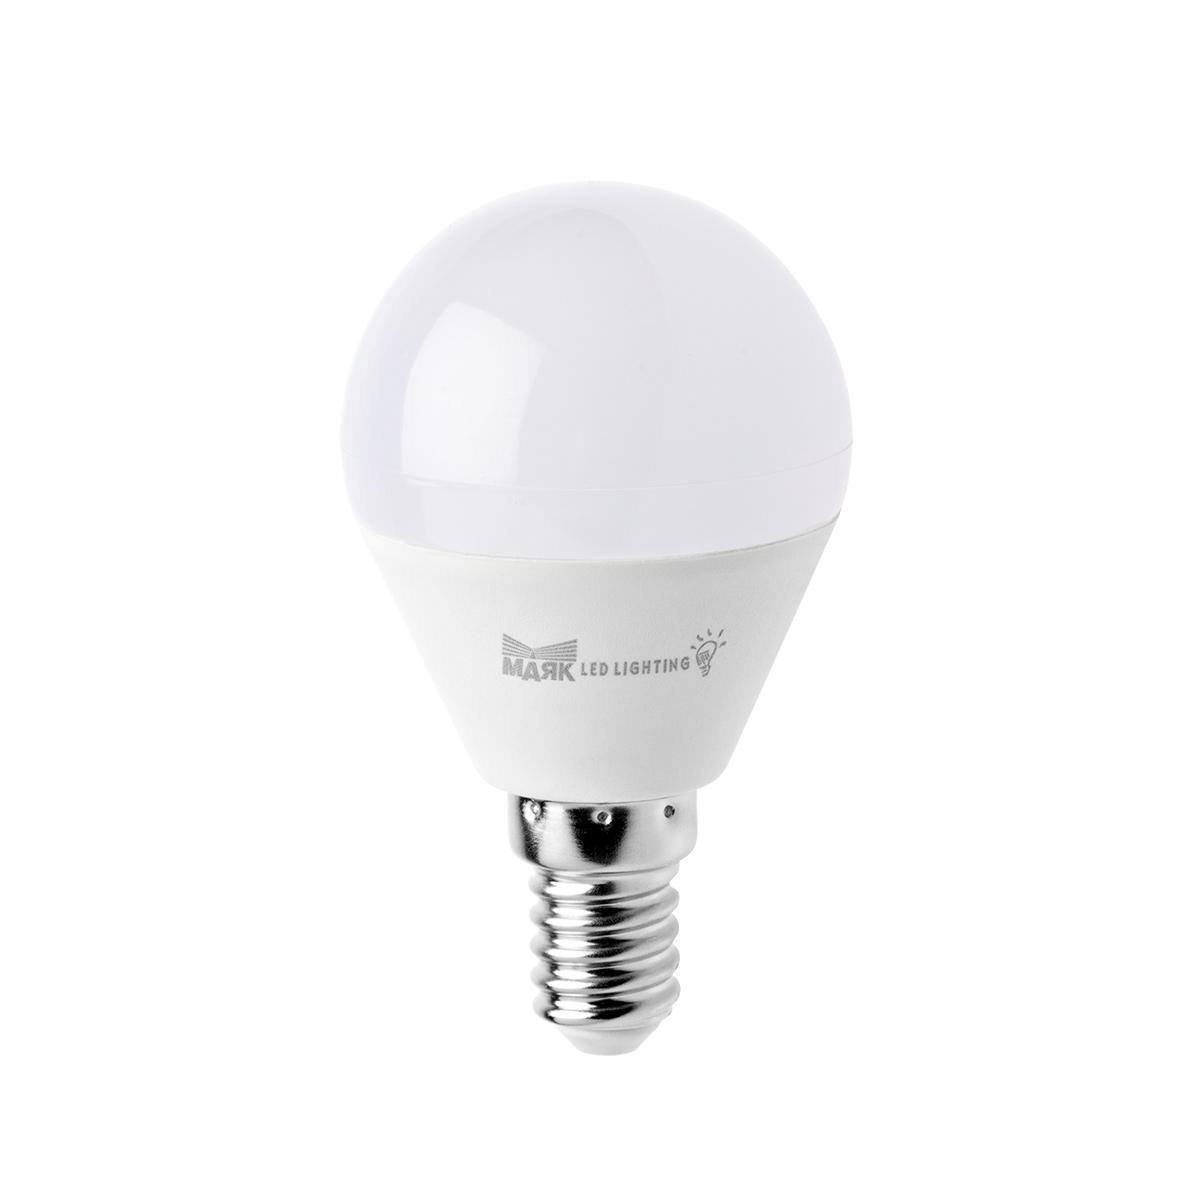 Лампа светодиодная МАЯК B45/e14/6w/4000k лампа светодиодная маяк c30 e14 6w 4000k